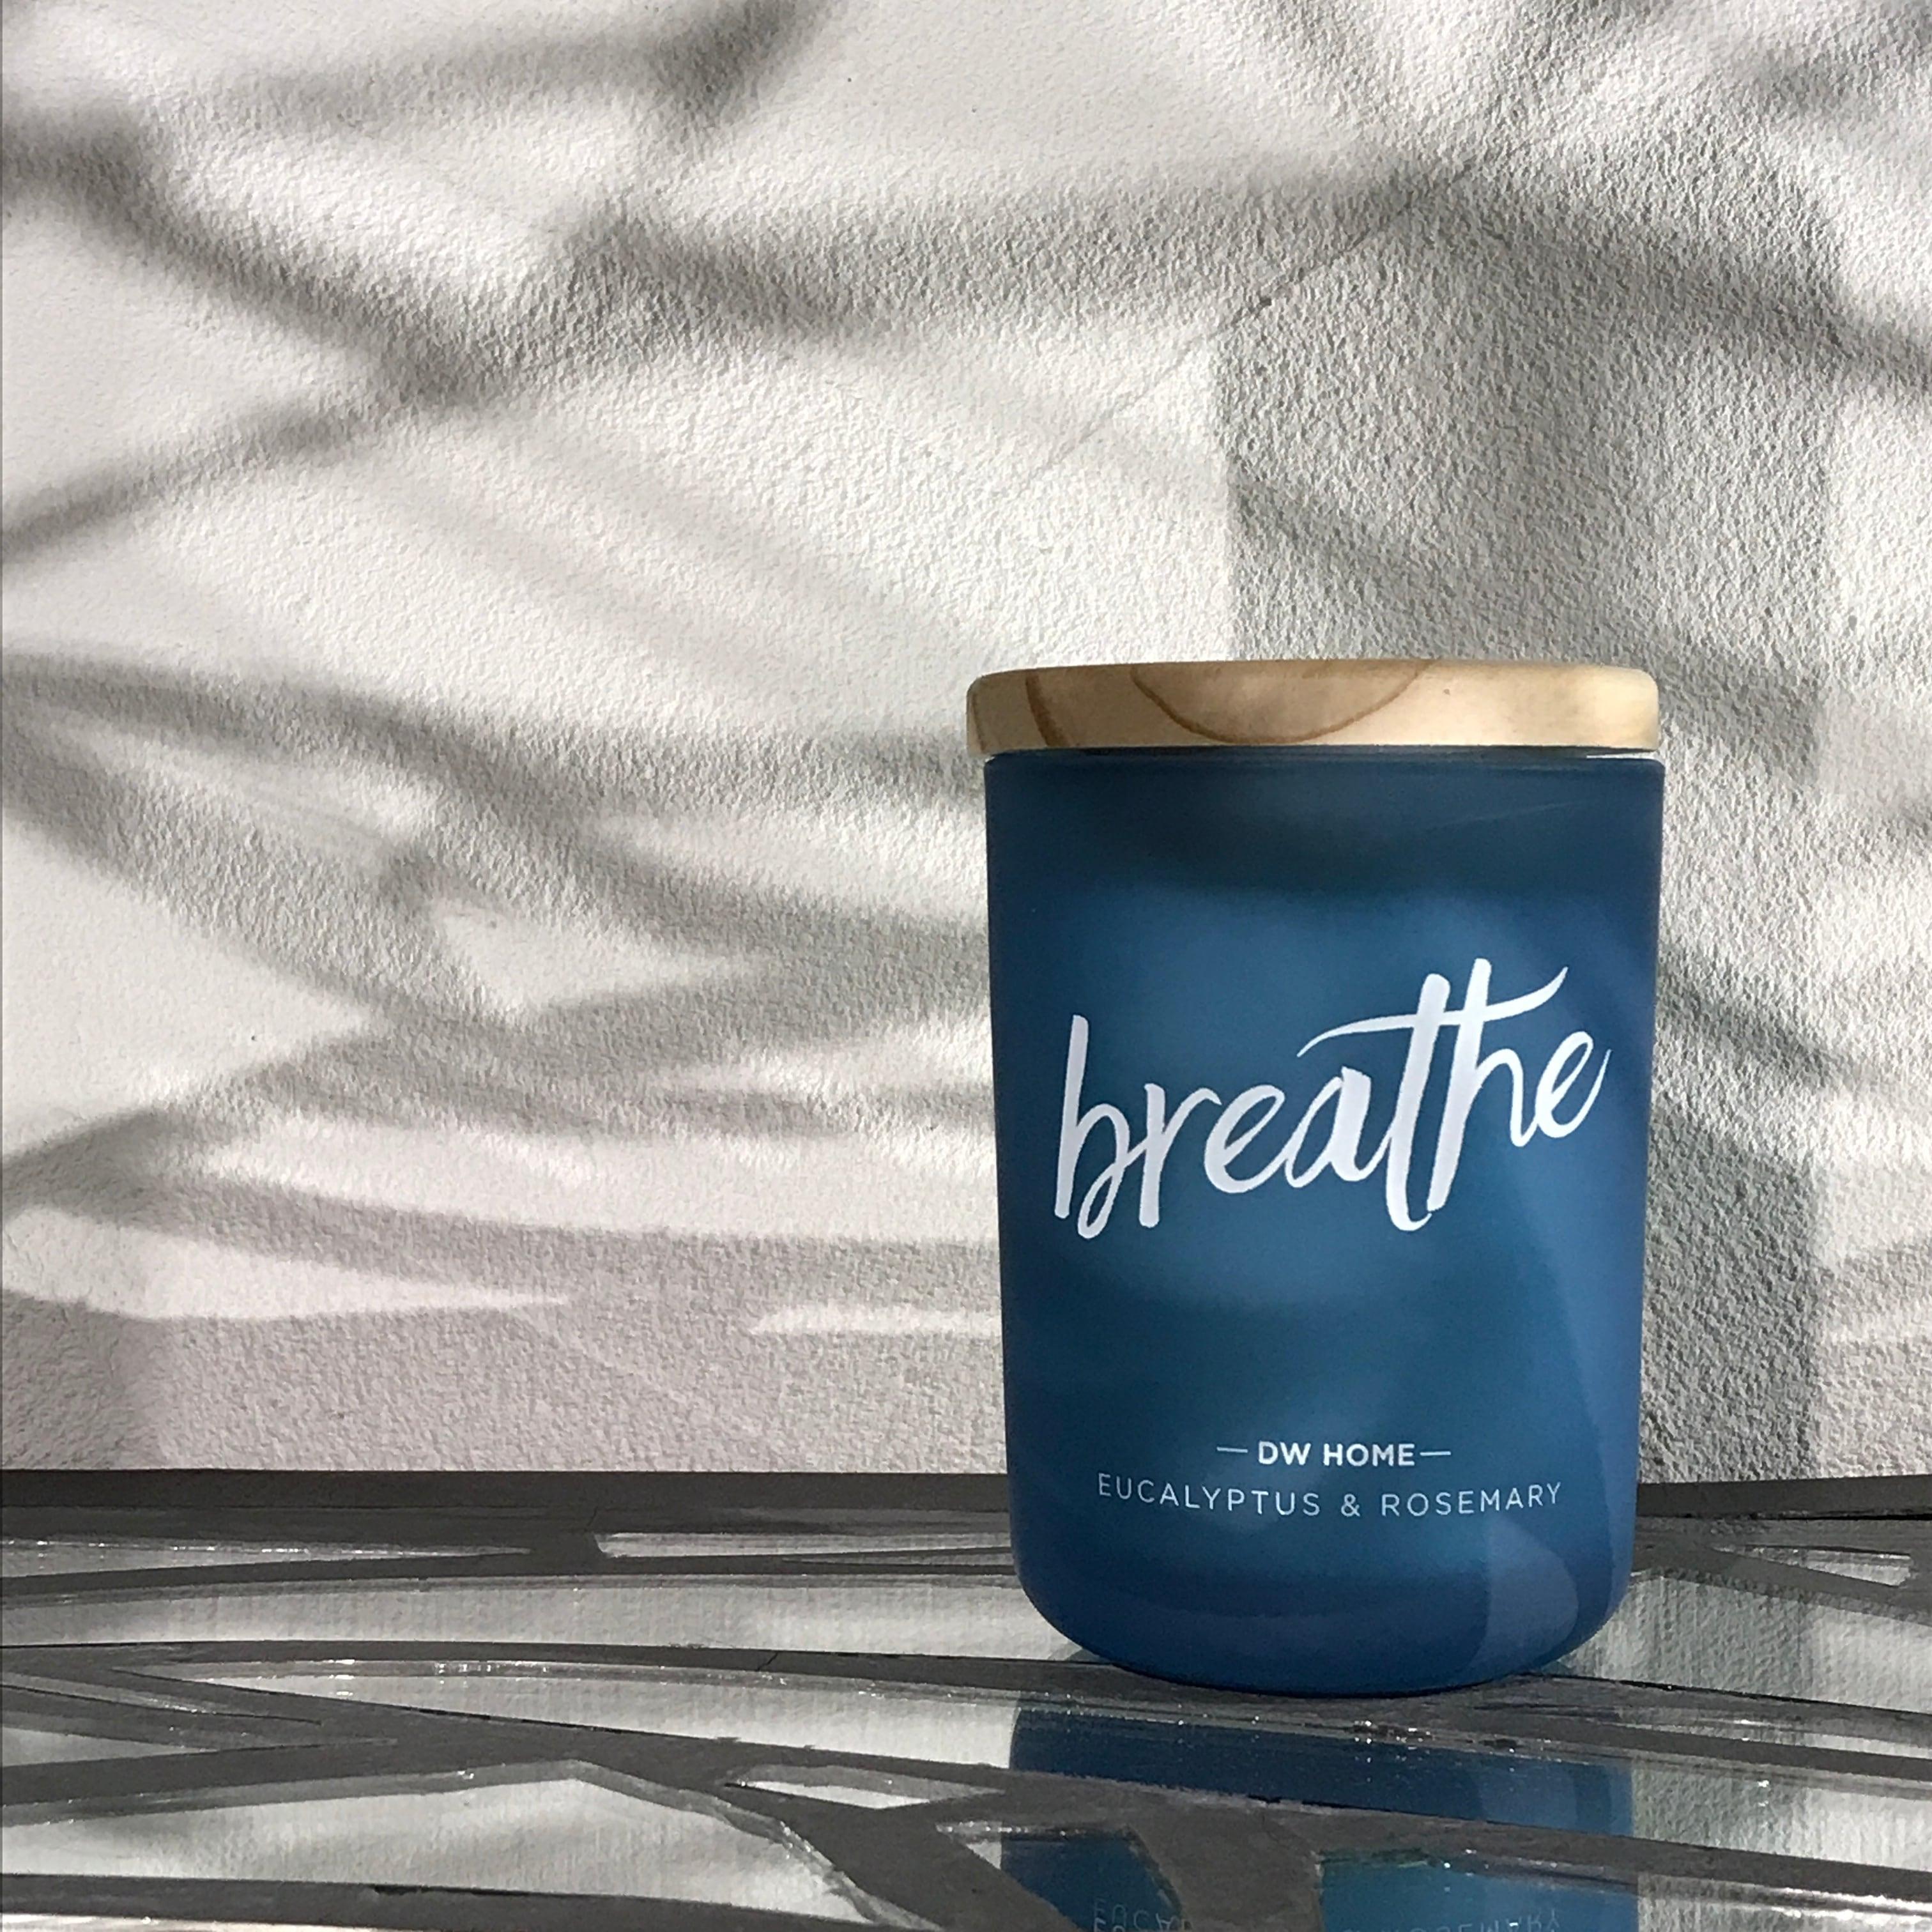 【DW Home Candles】breathe (EUCALYPTUS & ROSEMARY)